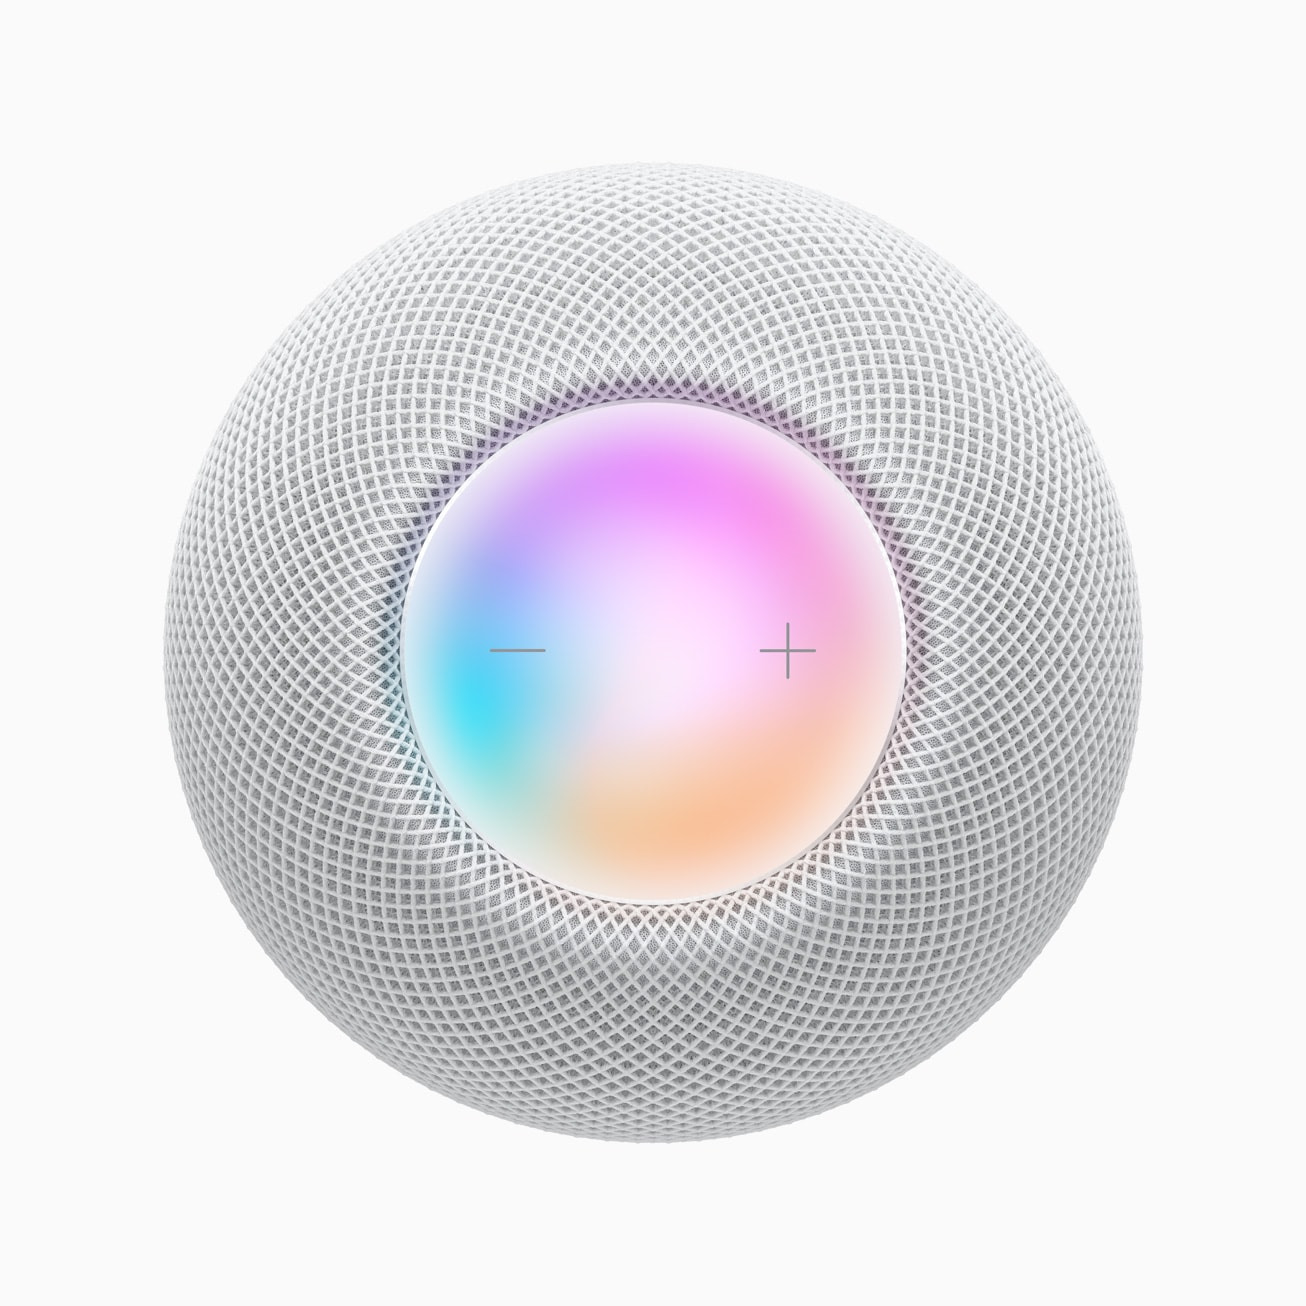 First HomePod mini reviews: That Siri swirl proves mesmerizing.